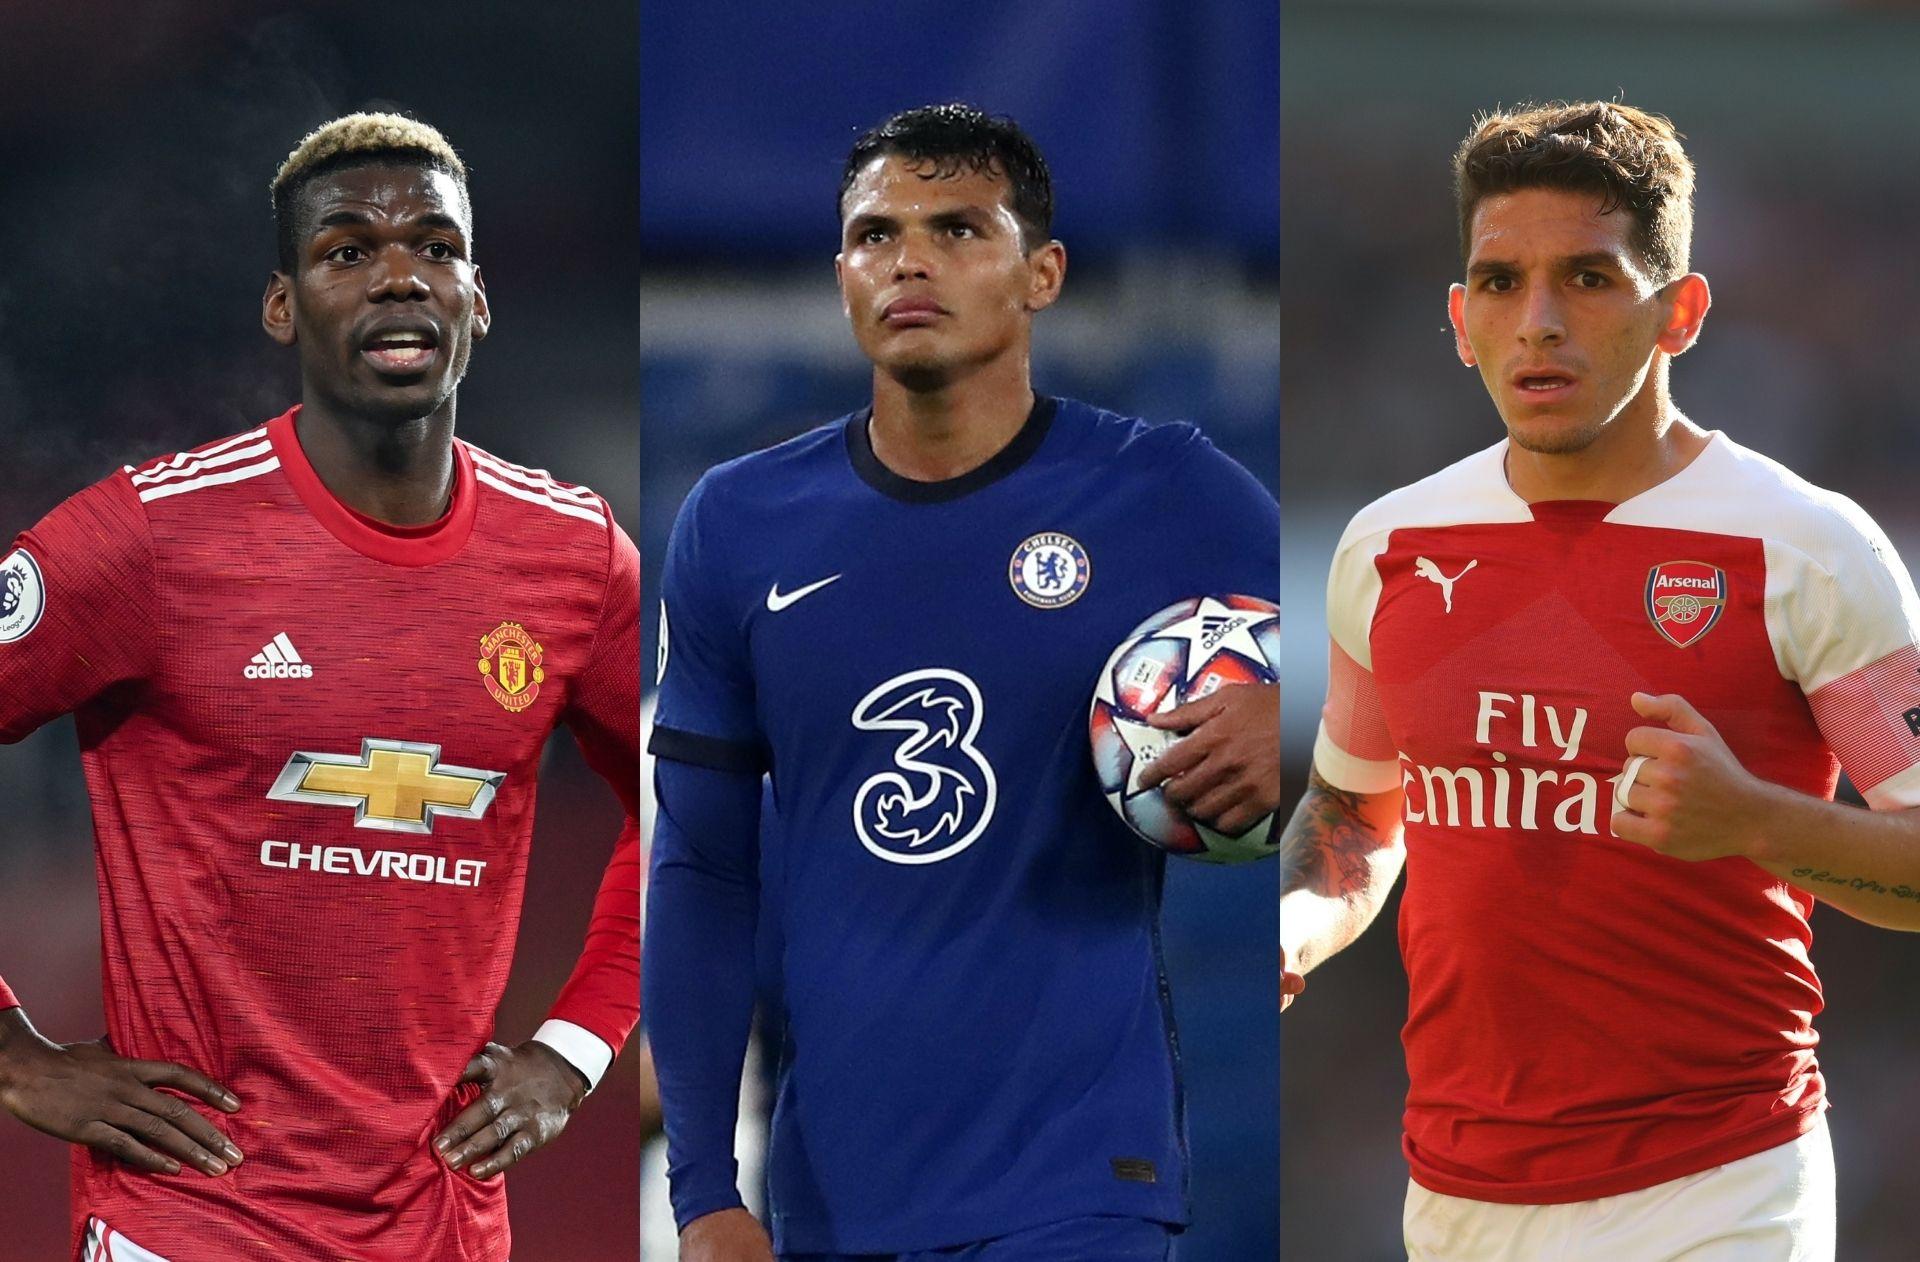 Sunday's transfer rumors - Chelsea name Silva's long-term replacement